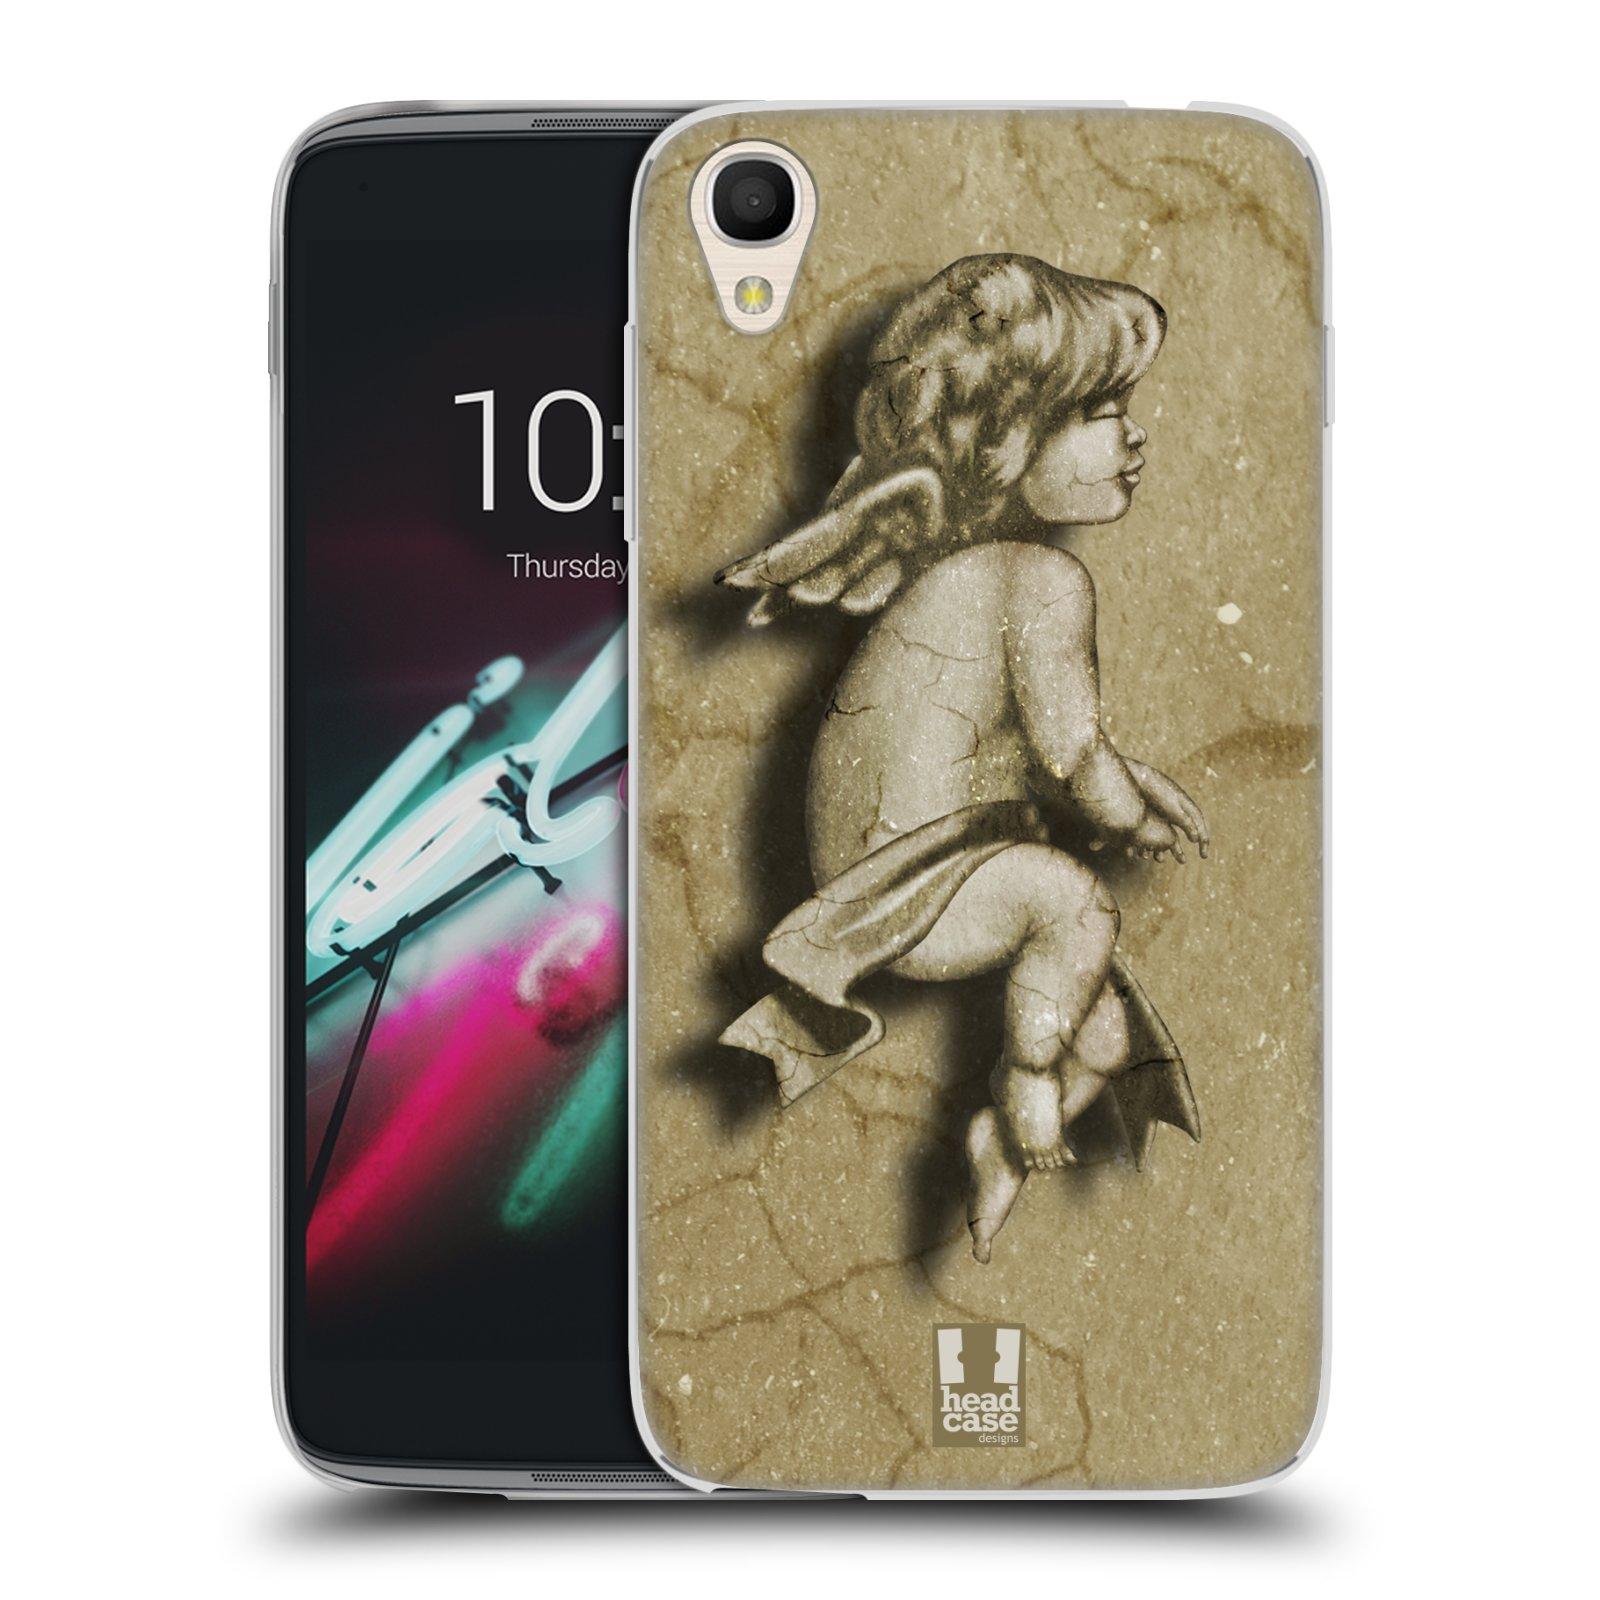 HEAD CASE silikonový obal na mobil Alcatel Idol 3 OT-6039Y (4.7) vzor Andělé z kamene LAZAR